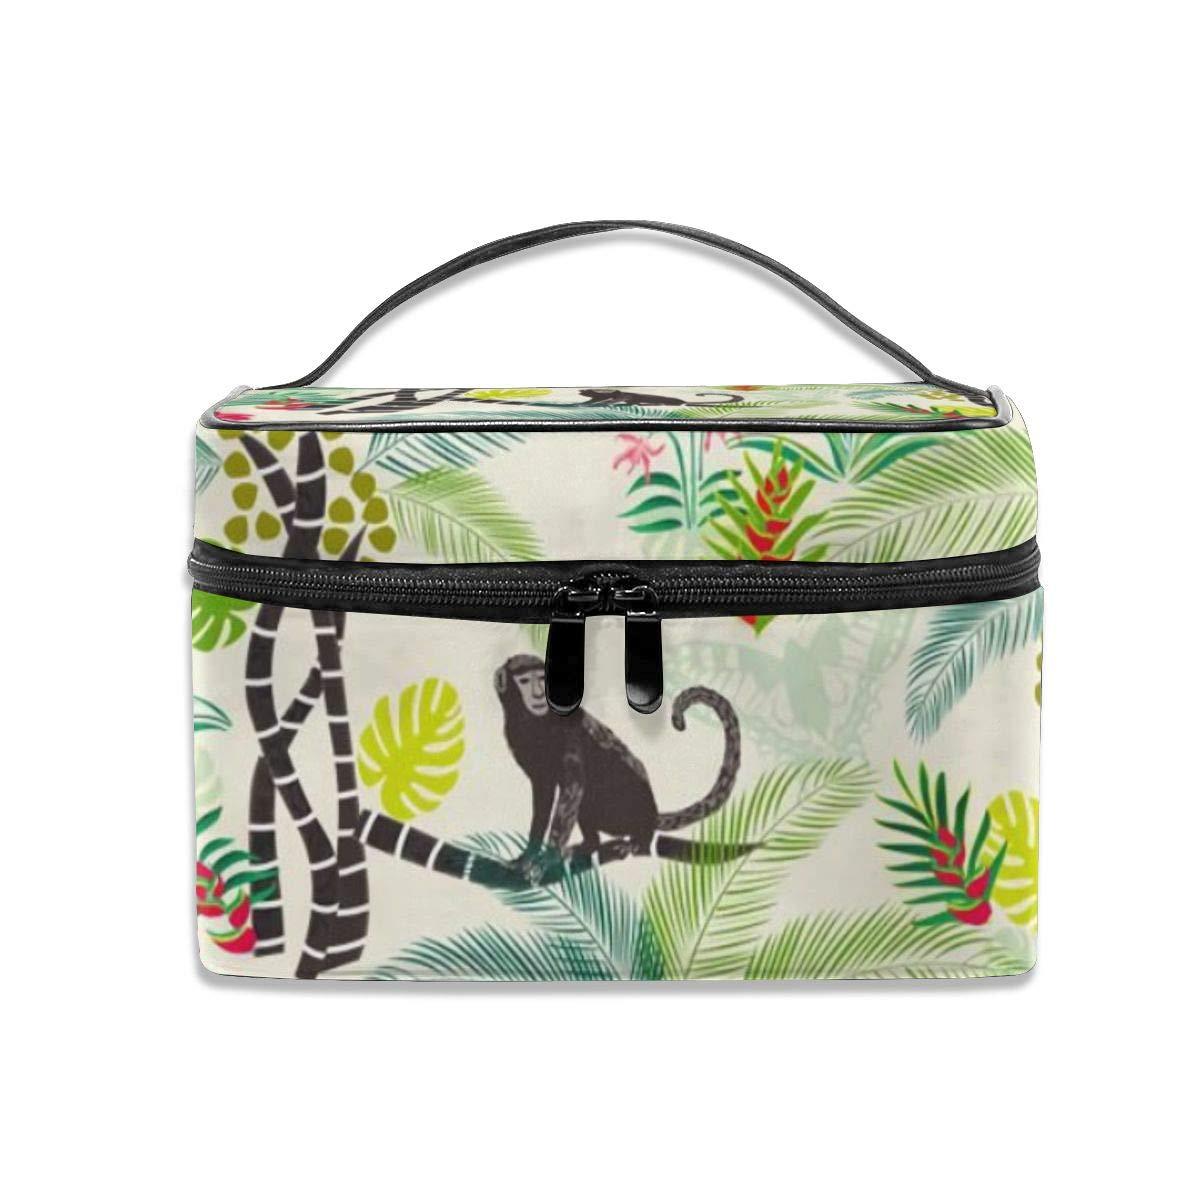 8ba495a2314c Amazon.com : Portable Travel Toiletry Bag Organizer, Tropical ...